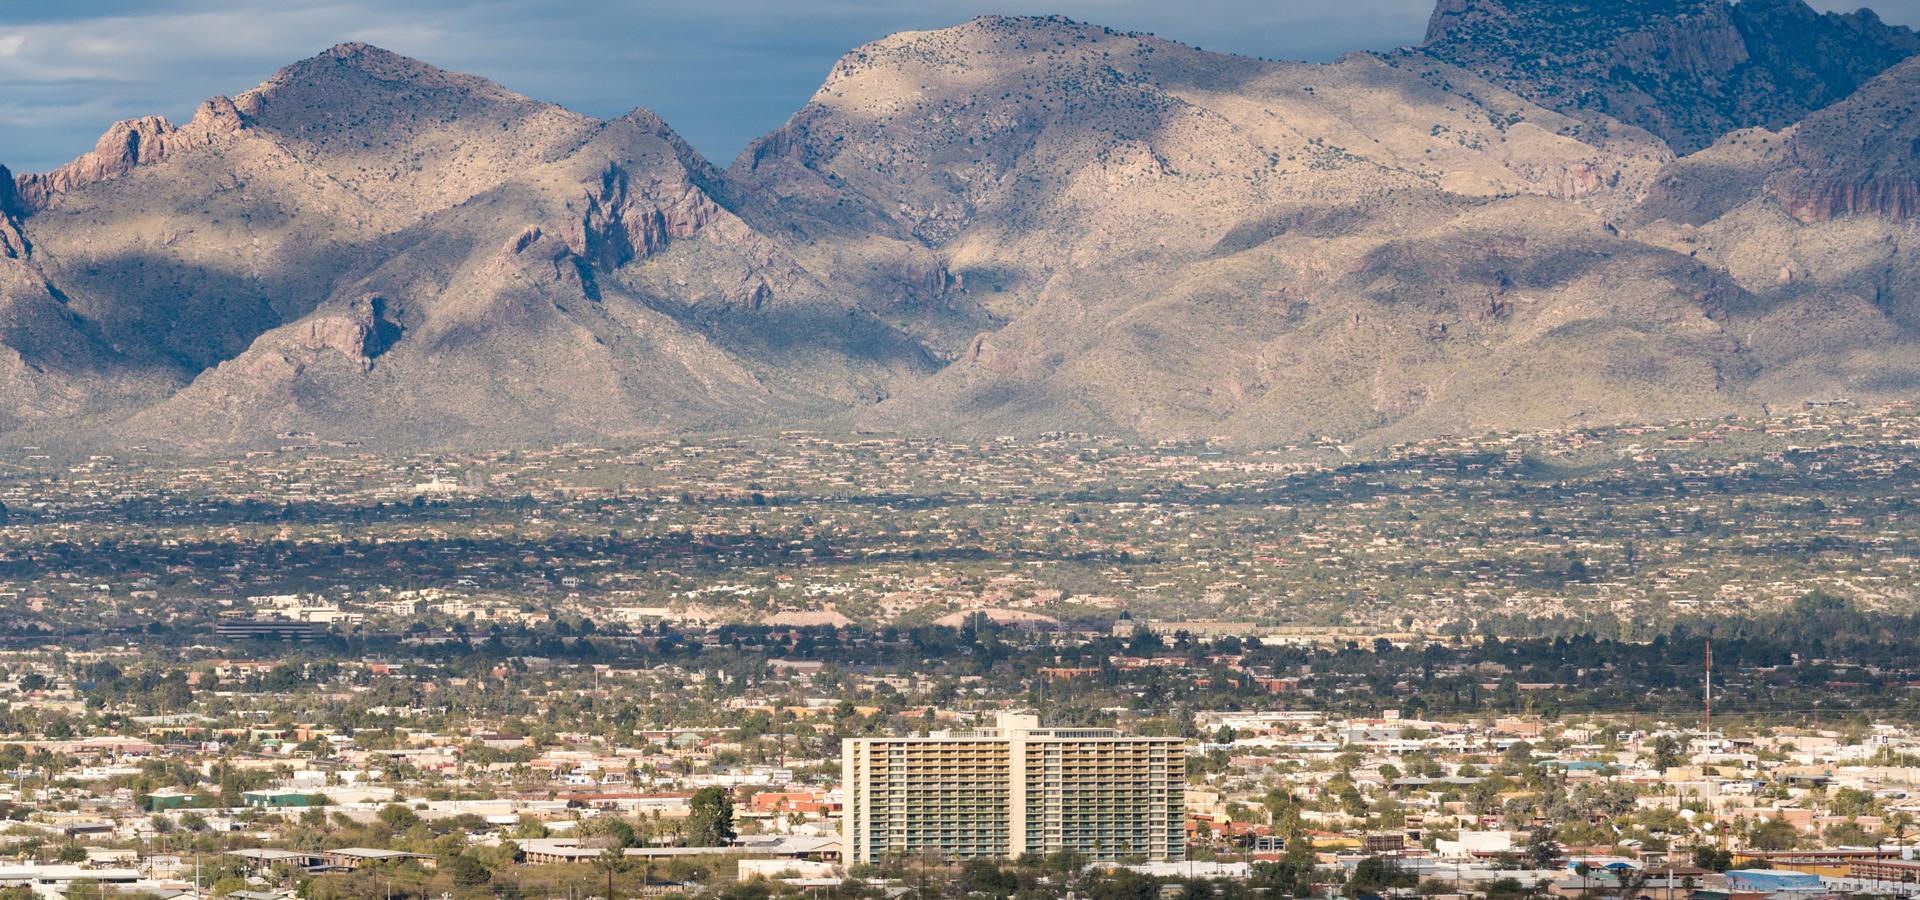 Peer-to-peer advisory in Tucson, Arizona, USA